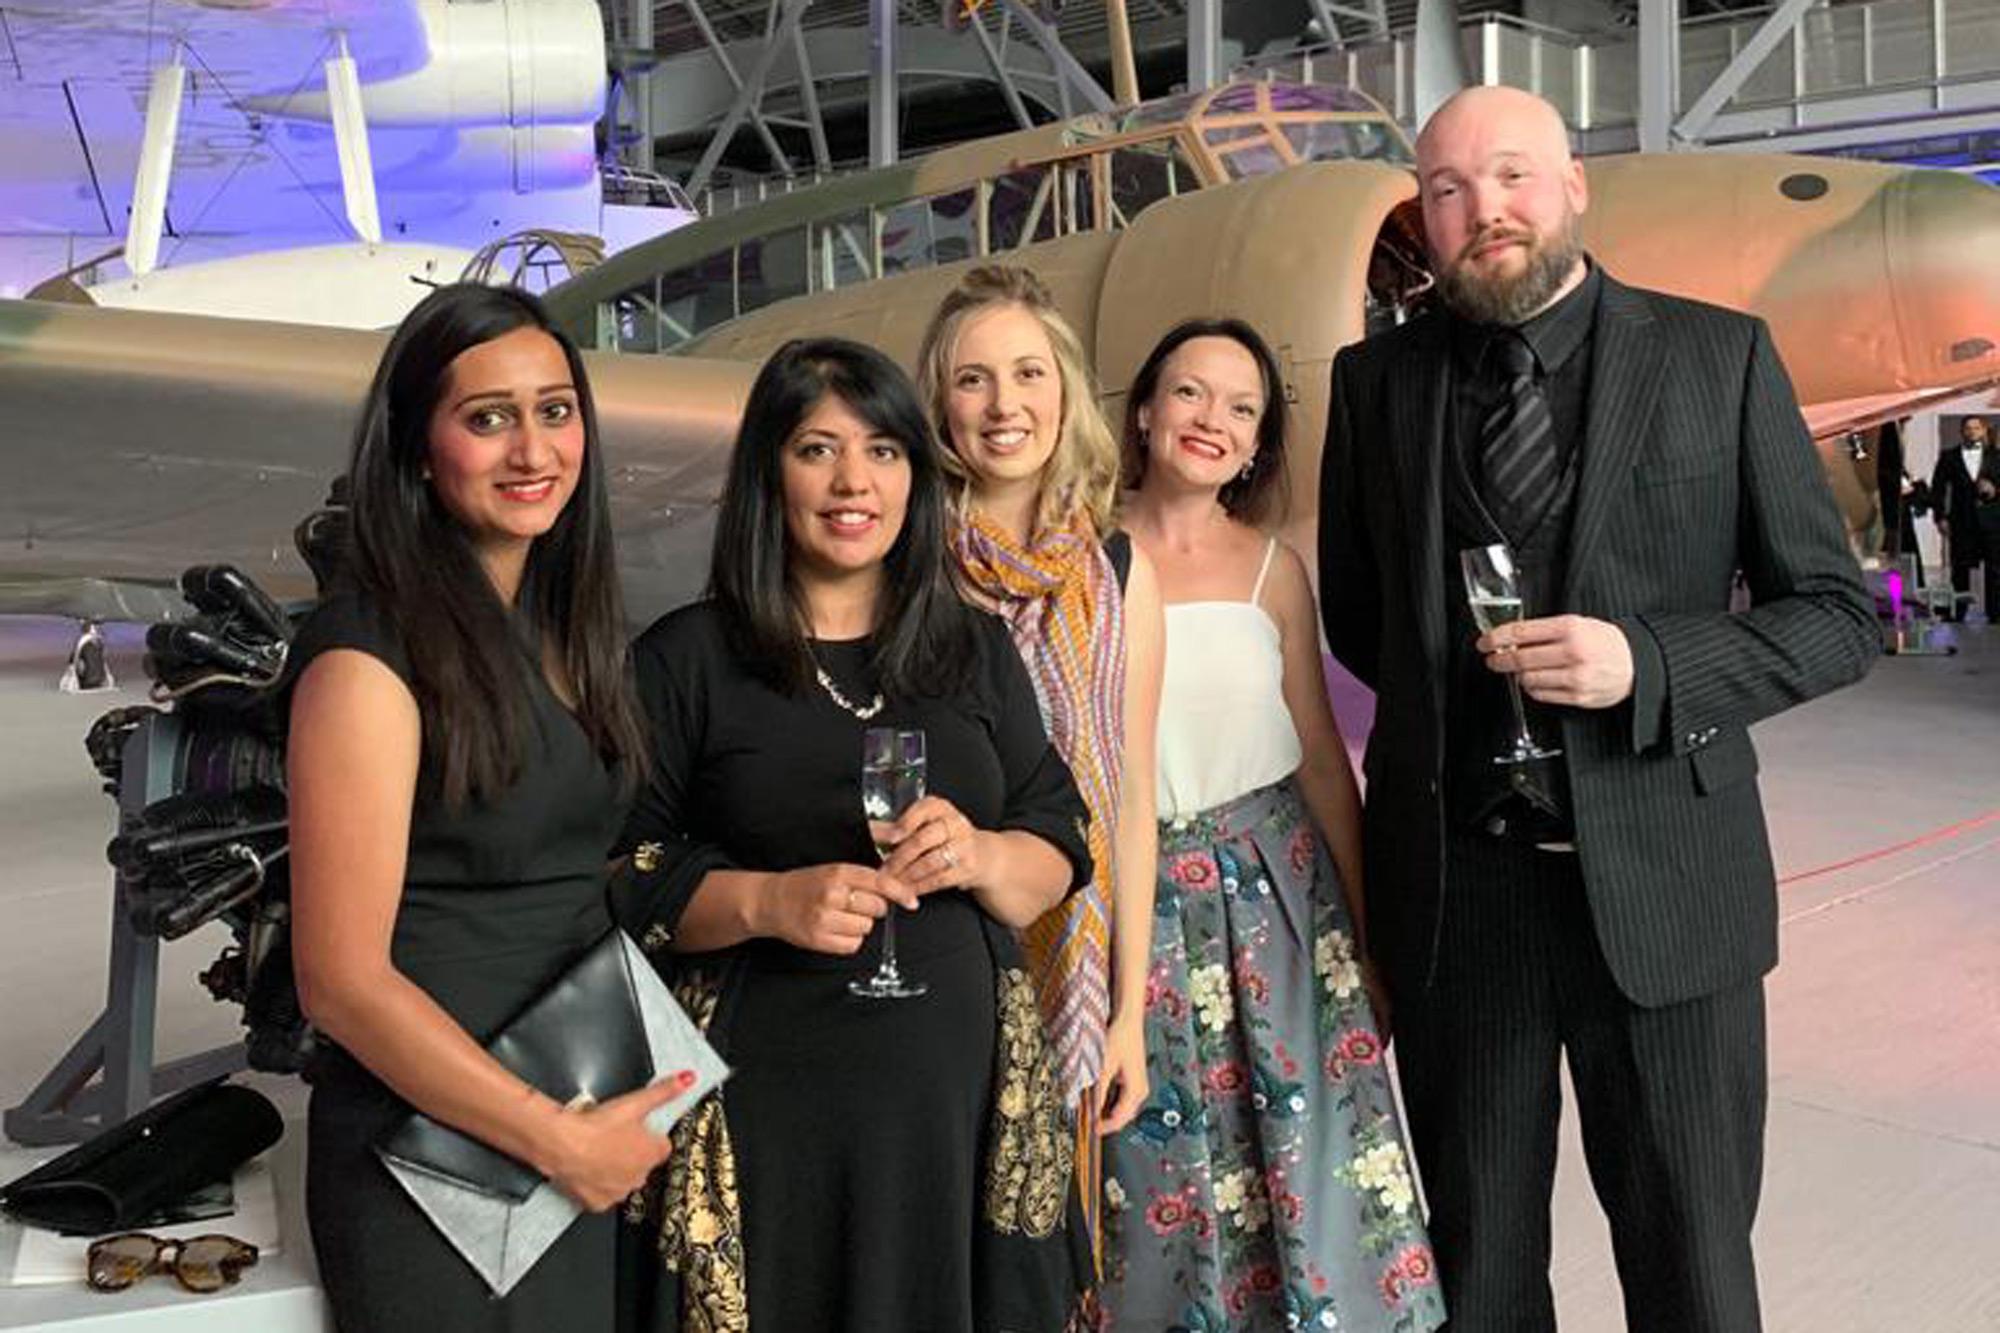 Sookio+team+at+SME+Awards+2019.jpeg